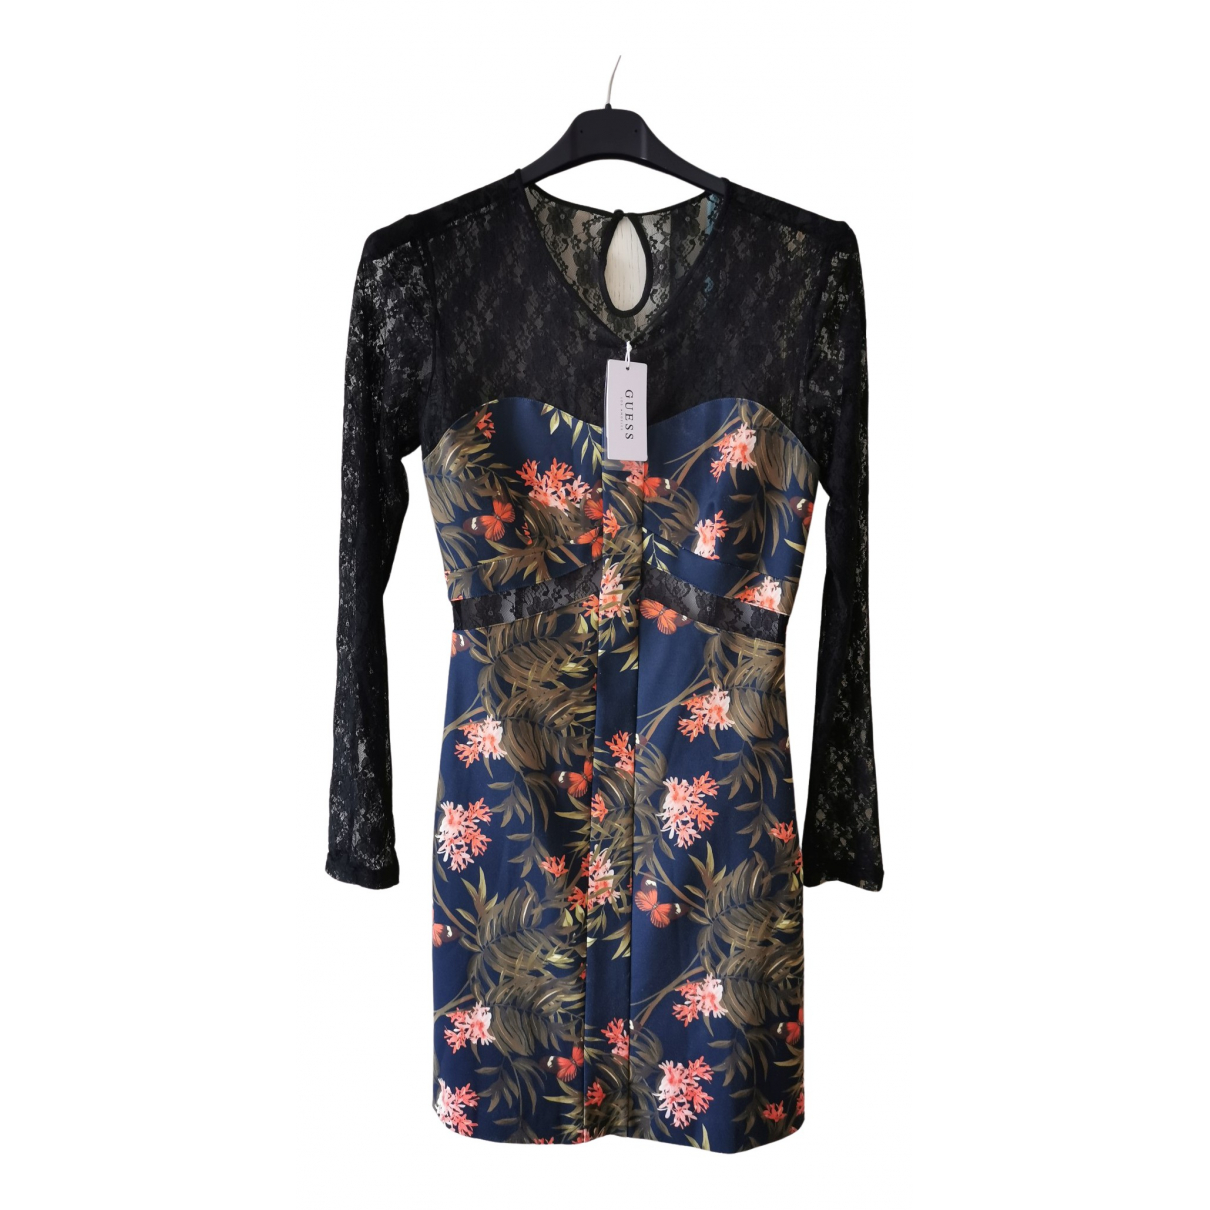 Guess \N Black dress for Women 34 FR